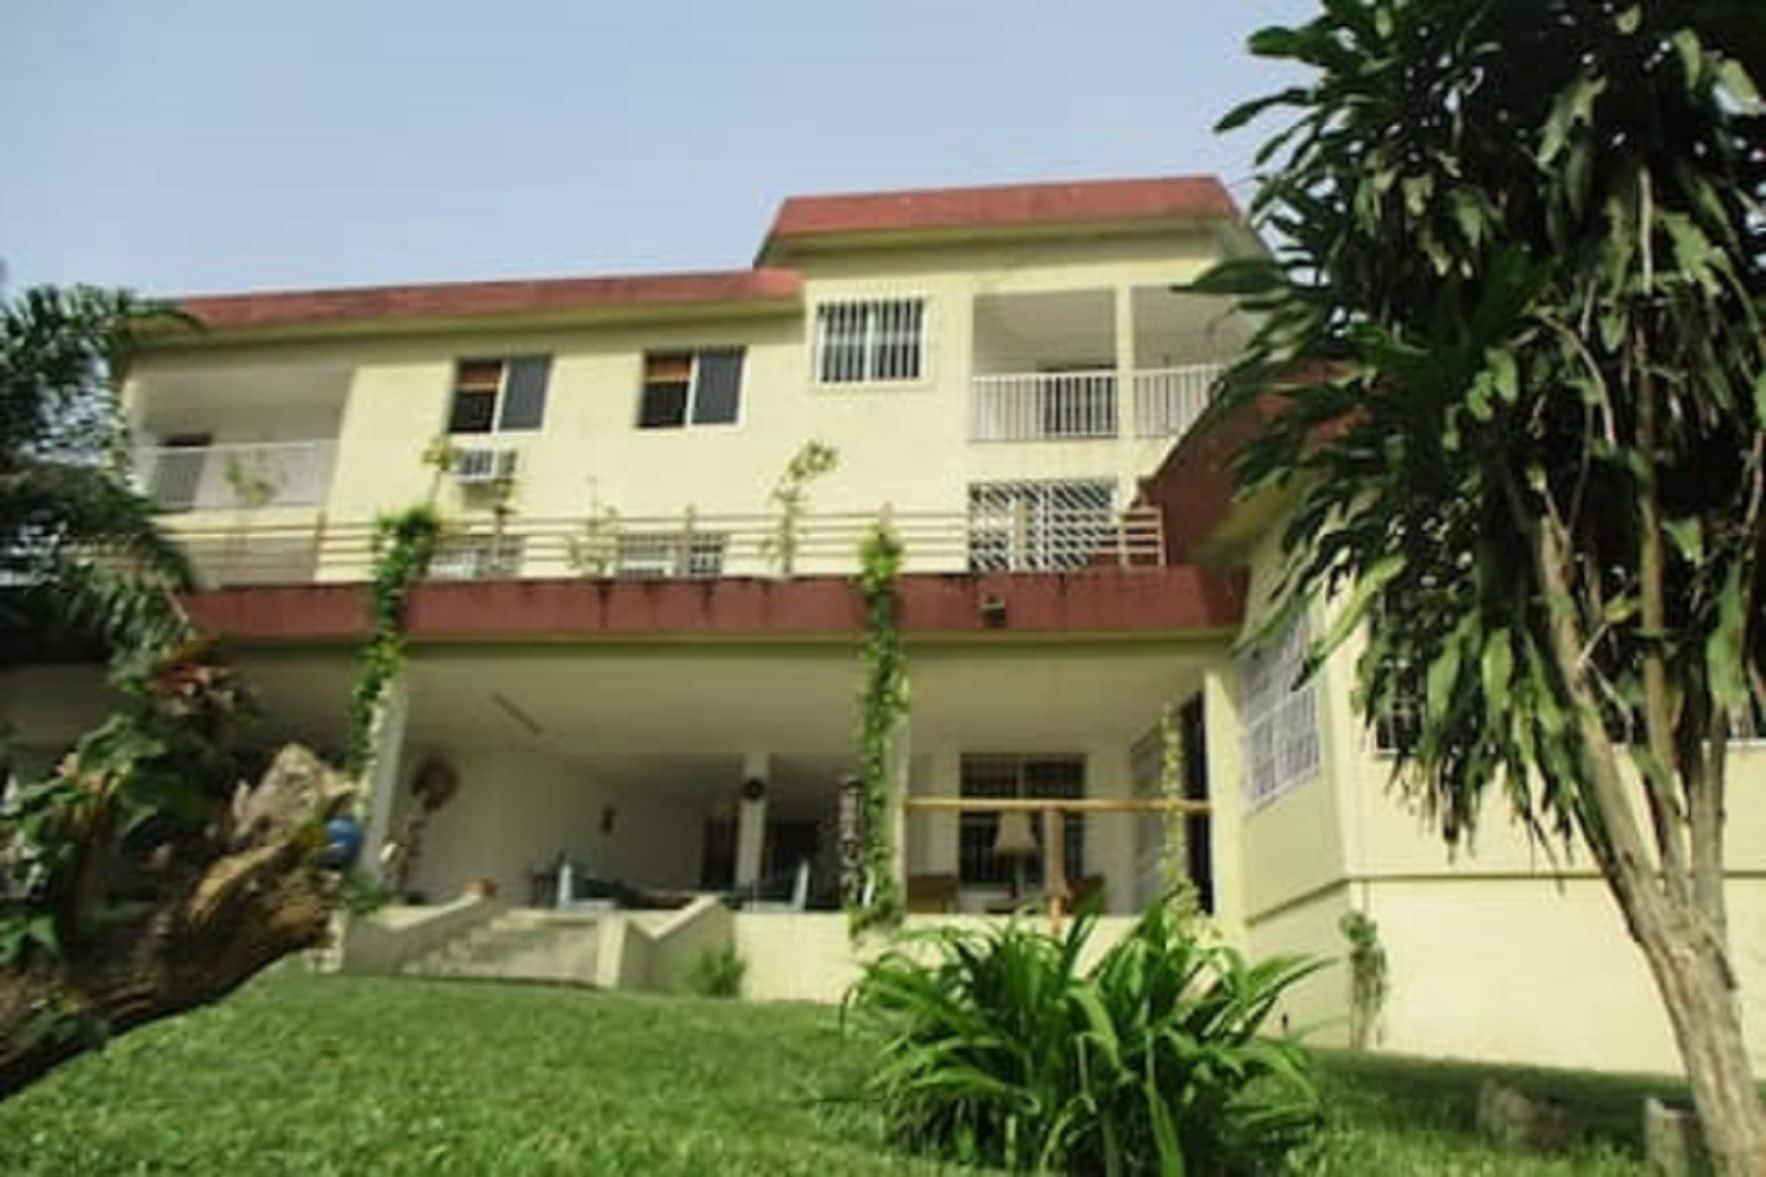 La maison Sopi, Abidjan